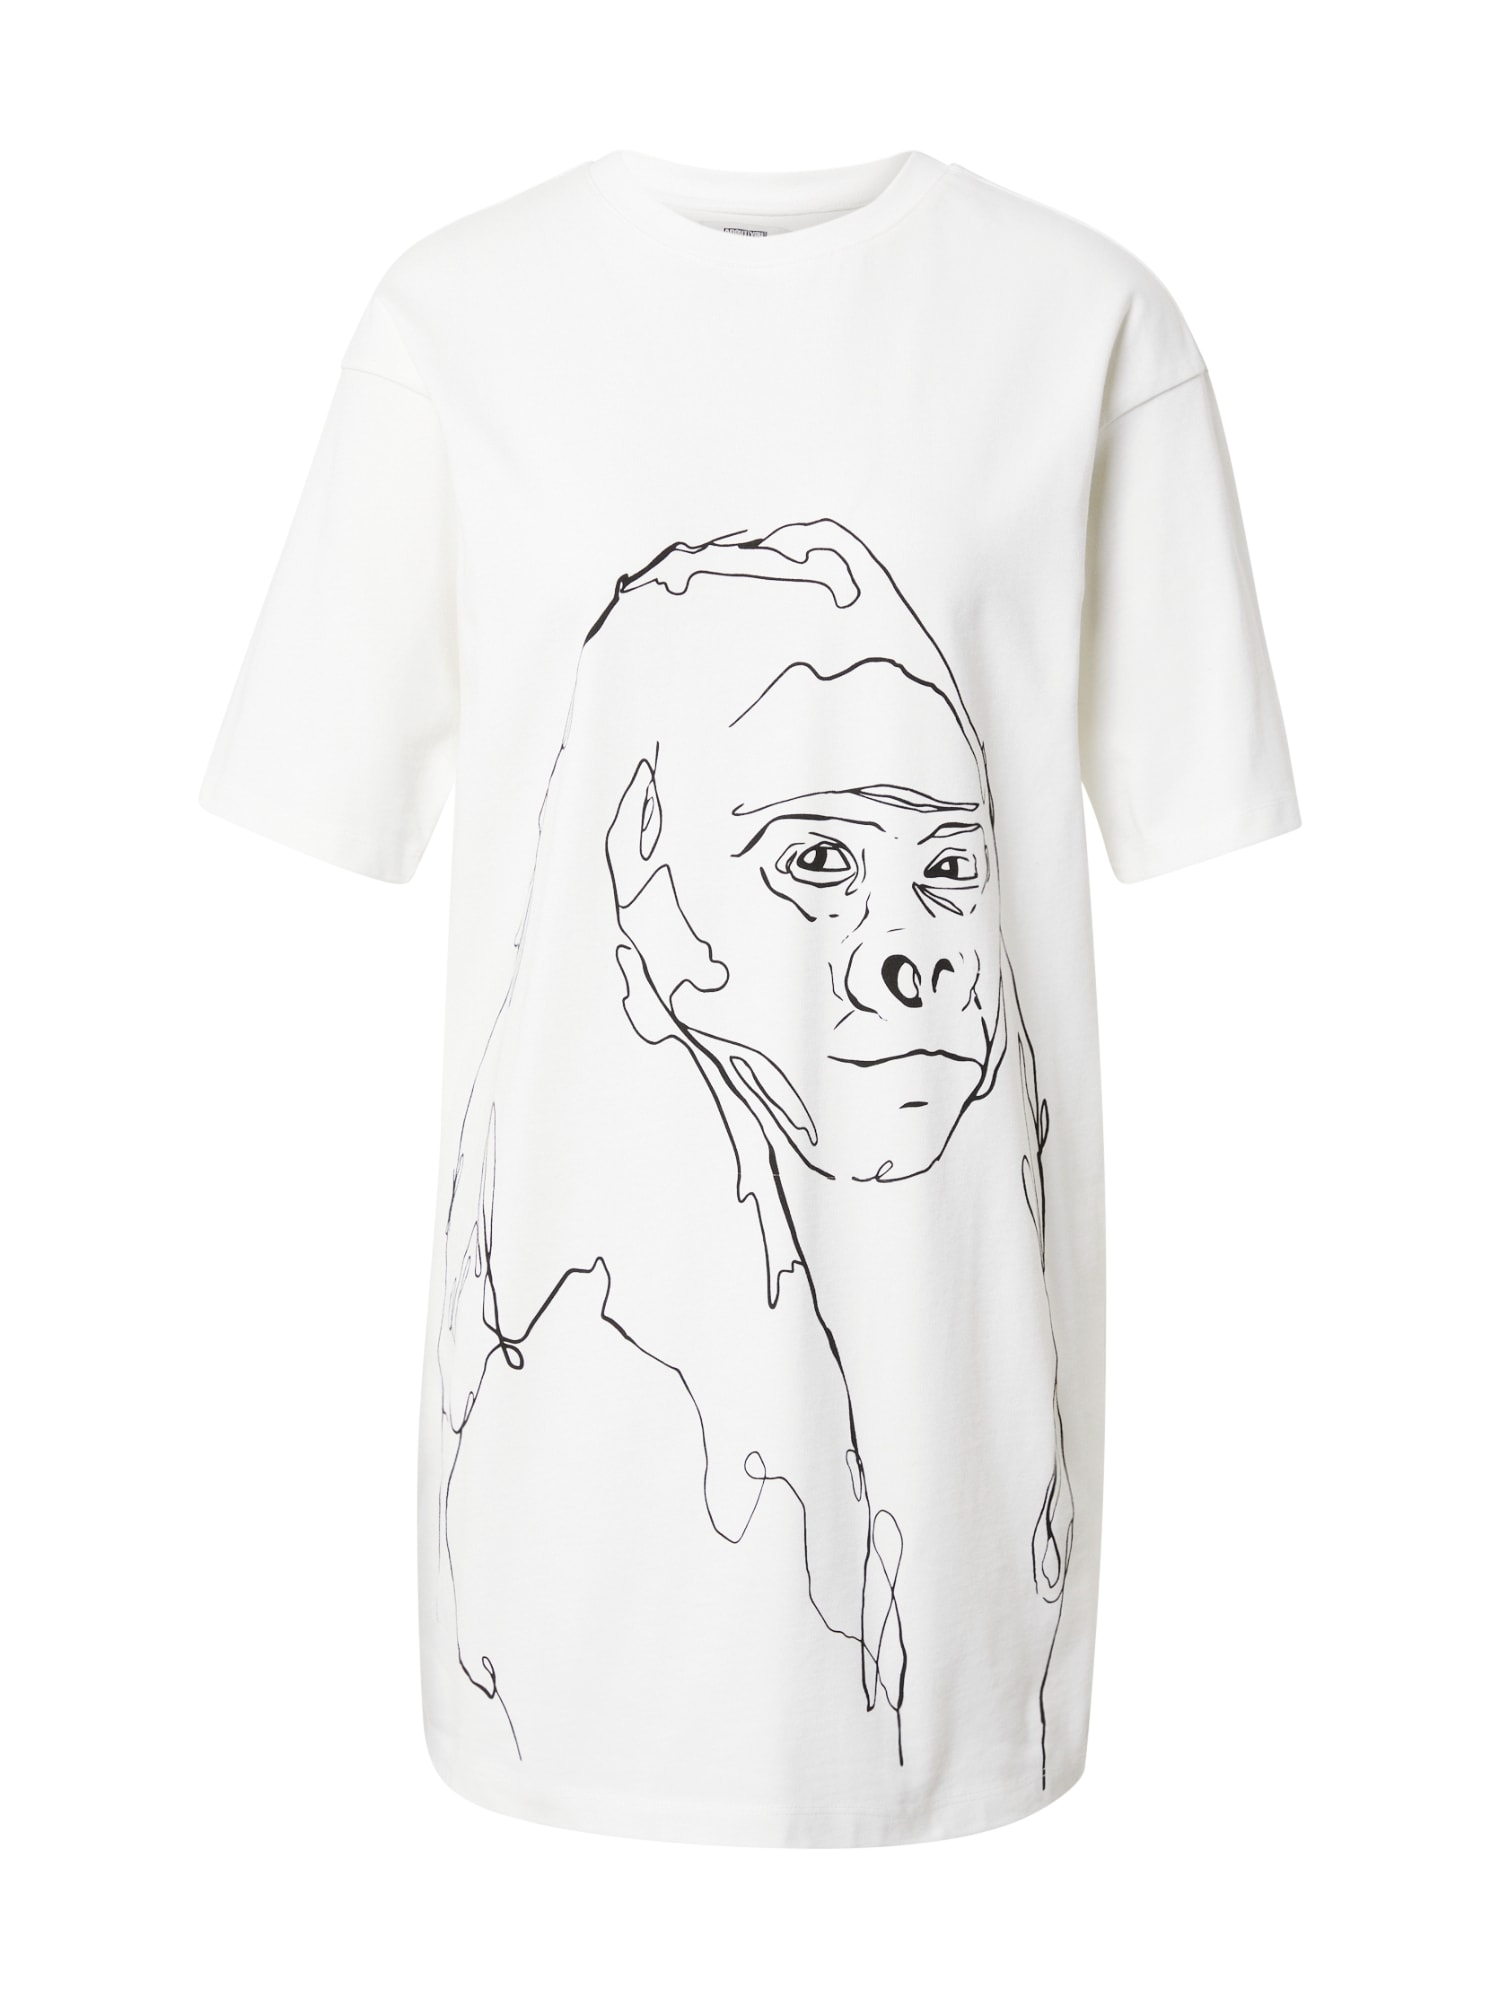 ABOUT YOU x MOGLI Marškinėliai